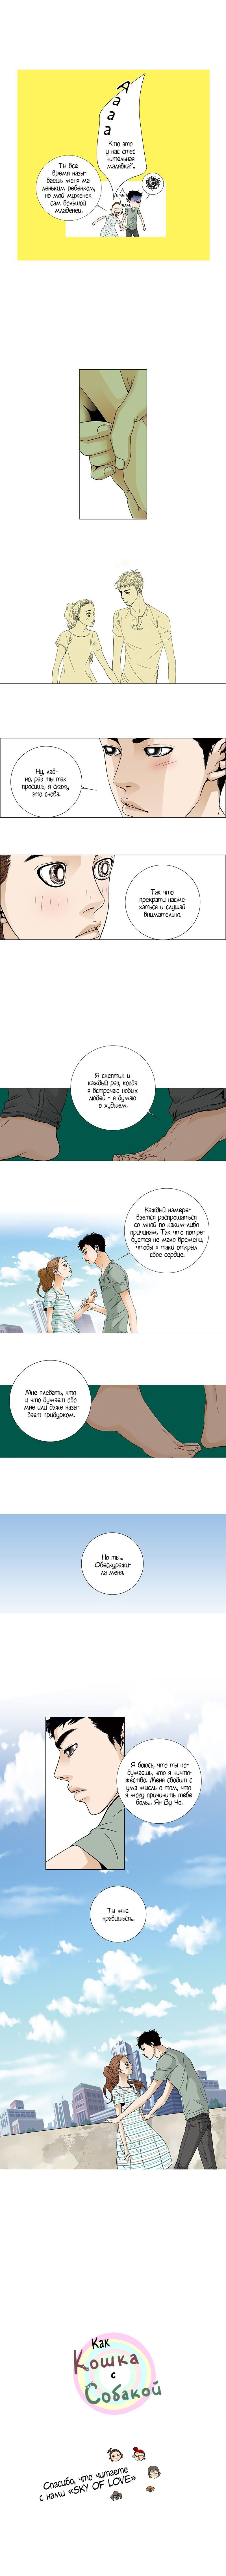 https://r1.ninemanga.com/comics/pic2/29/28573/344330/1512078555351.jpg Page 6